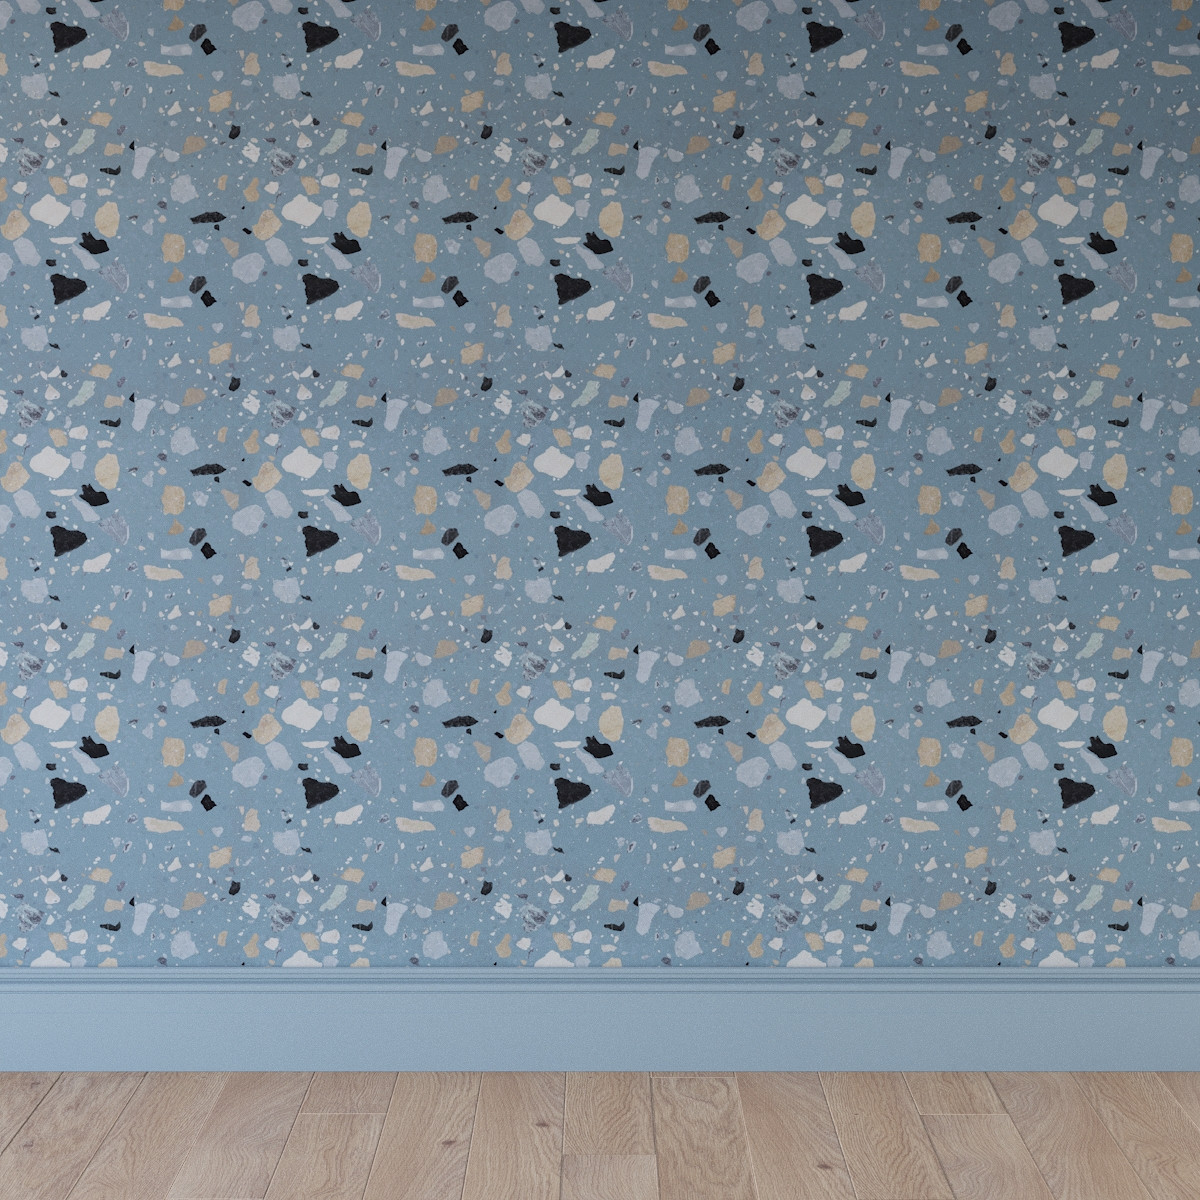 Peel And Stick Wallpaper Roll Dusty Blue Sperduti